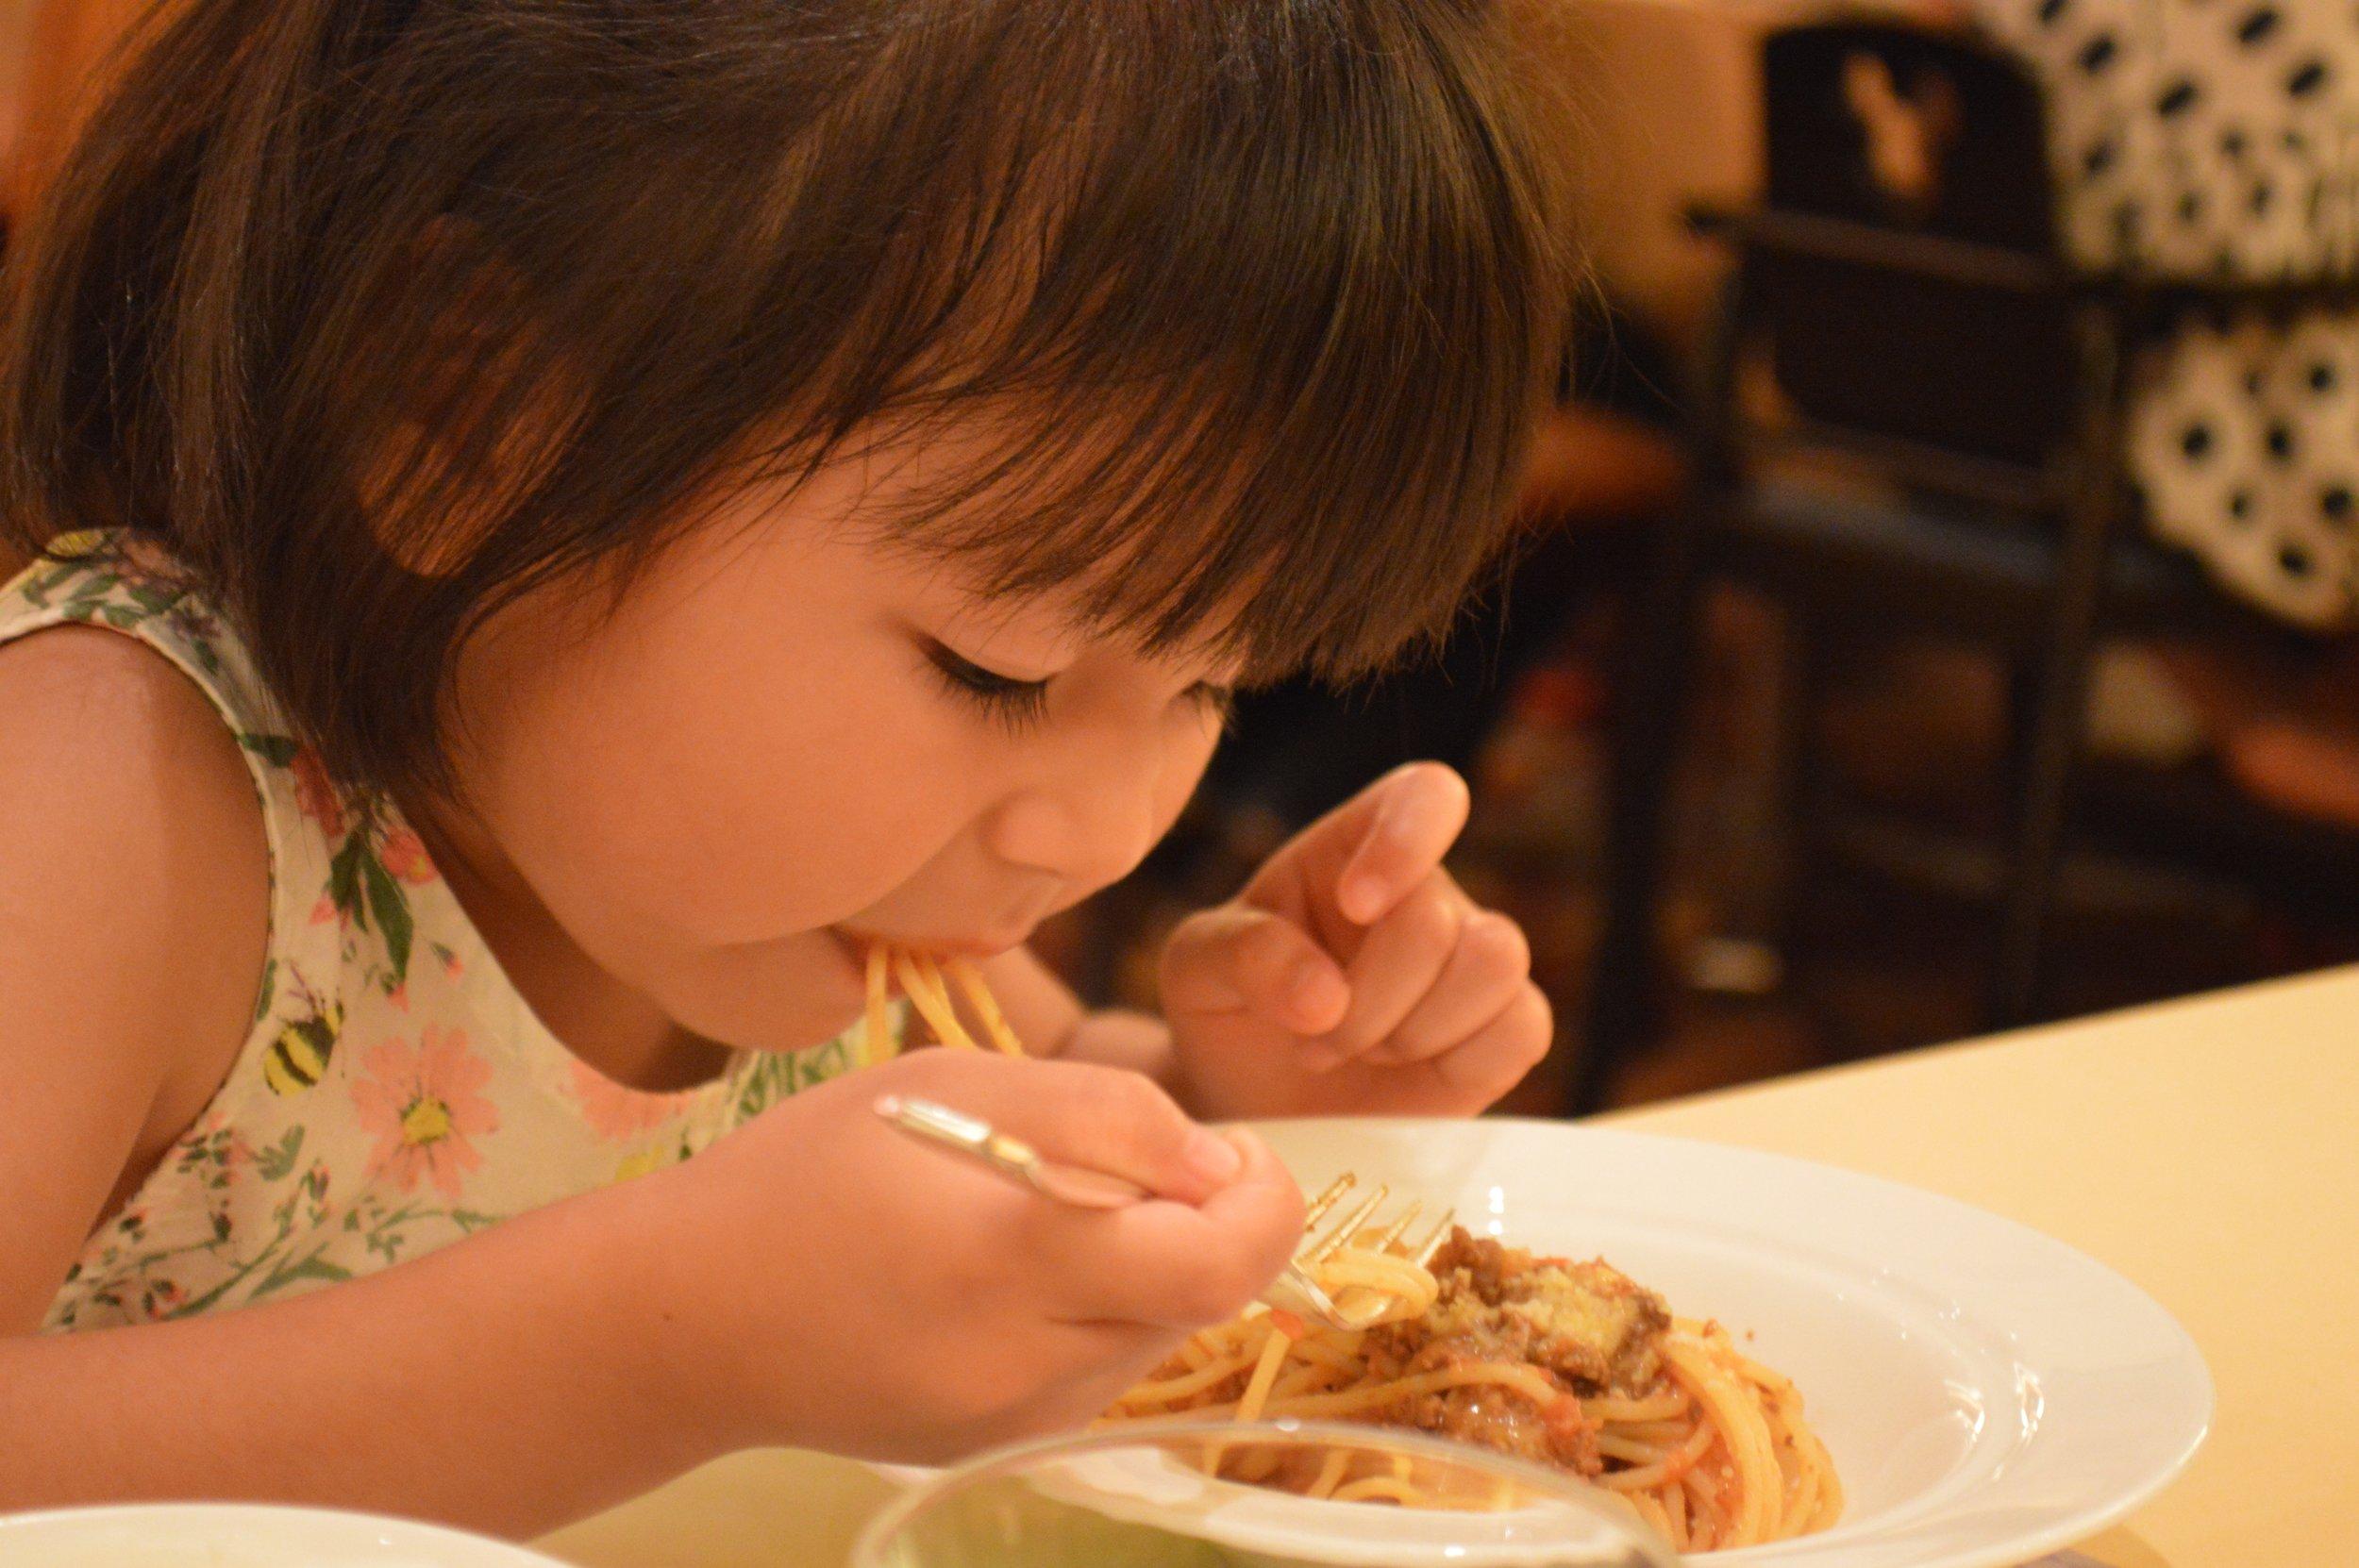 Little Mahina enjoying her spaghetti